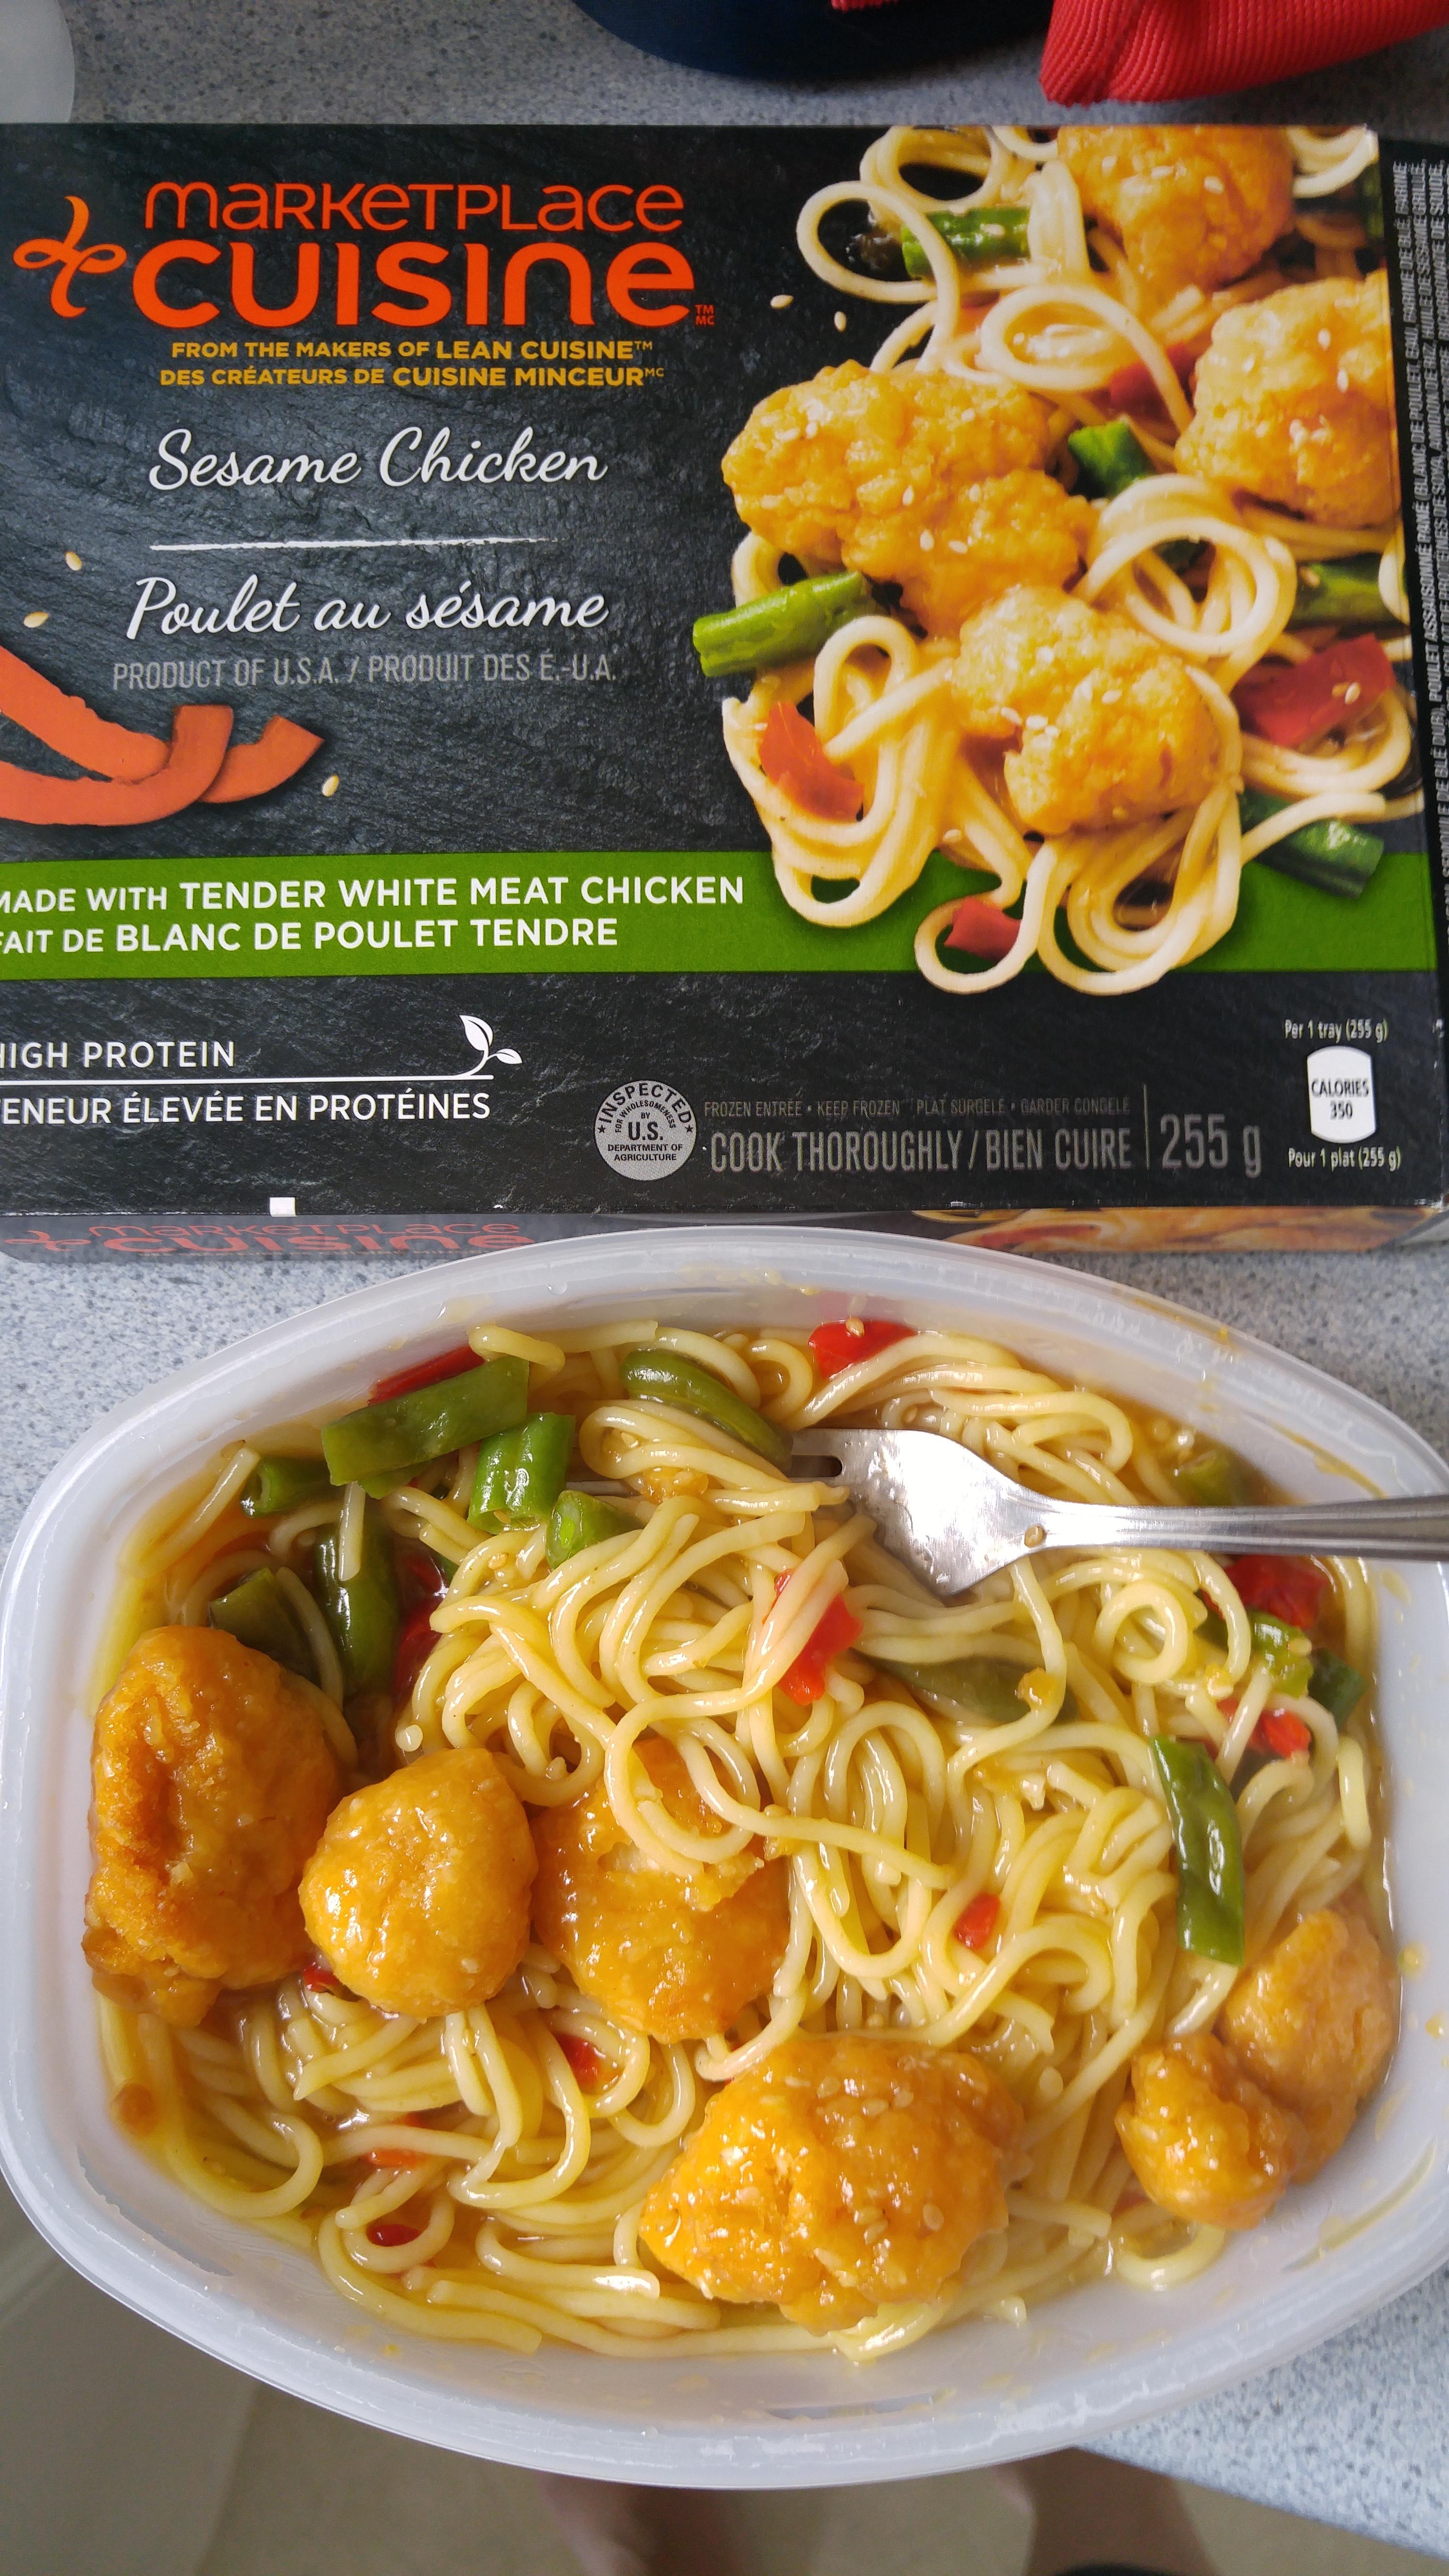 Image De Plat De Cuisine marketplace cuisine - sesame chicken reviews in frozen meals